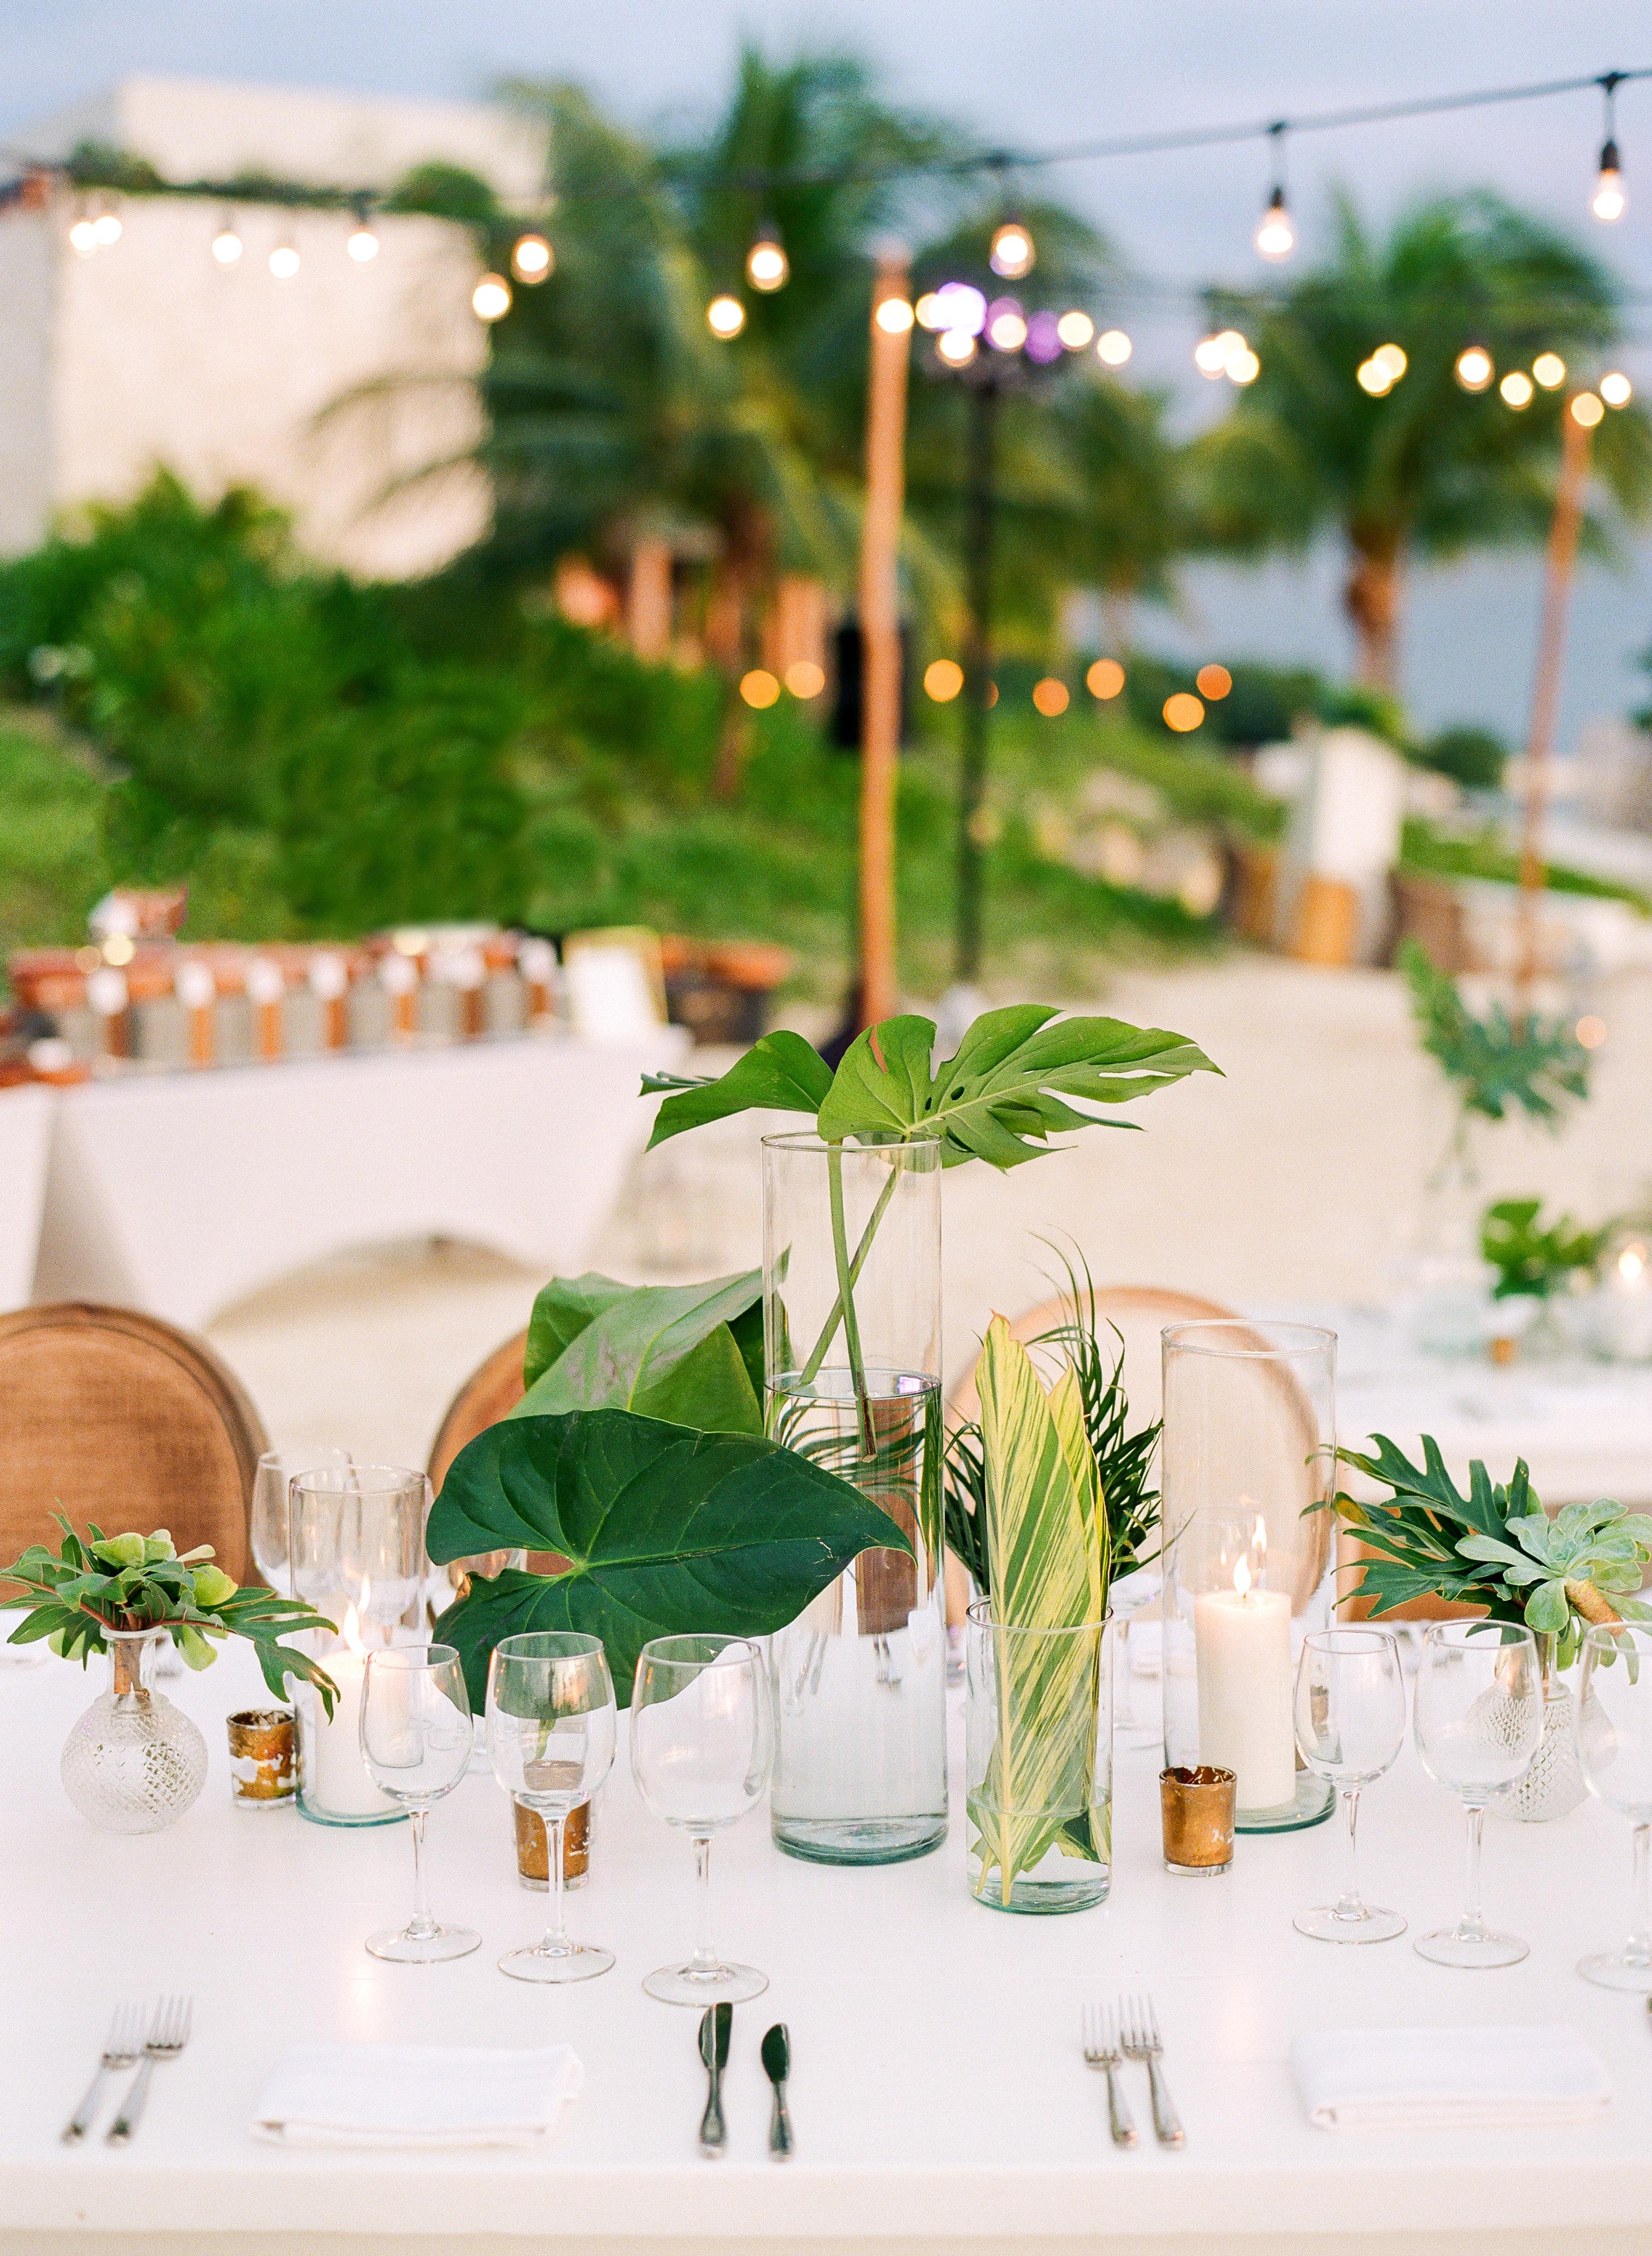 vicky james mexico leaf table decor